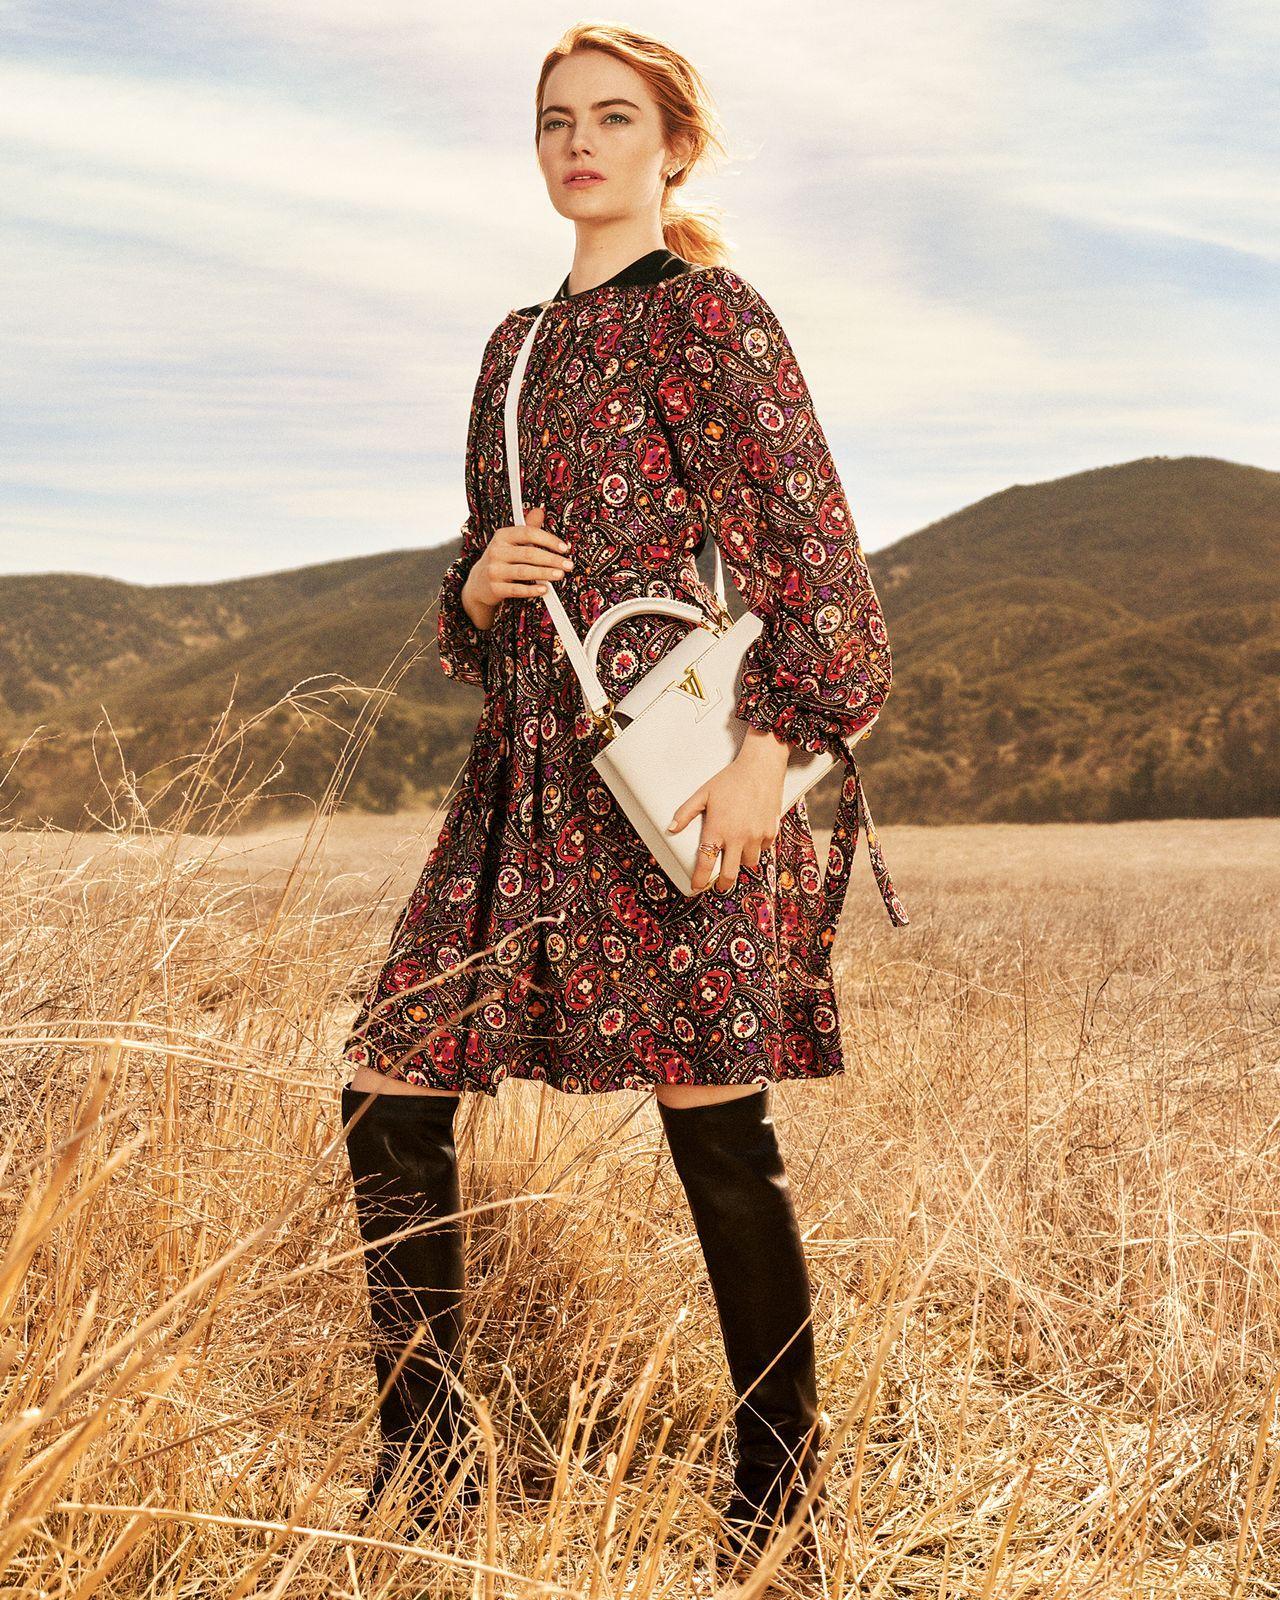 Emma Stone - Photoshoot for Louis Vuitton Pre-Fall 2018 ...